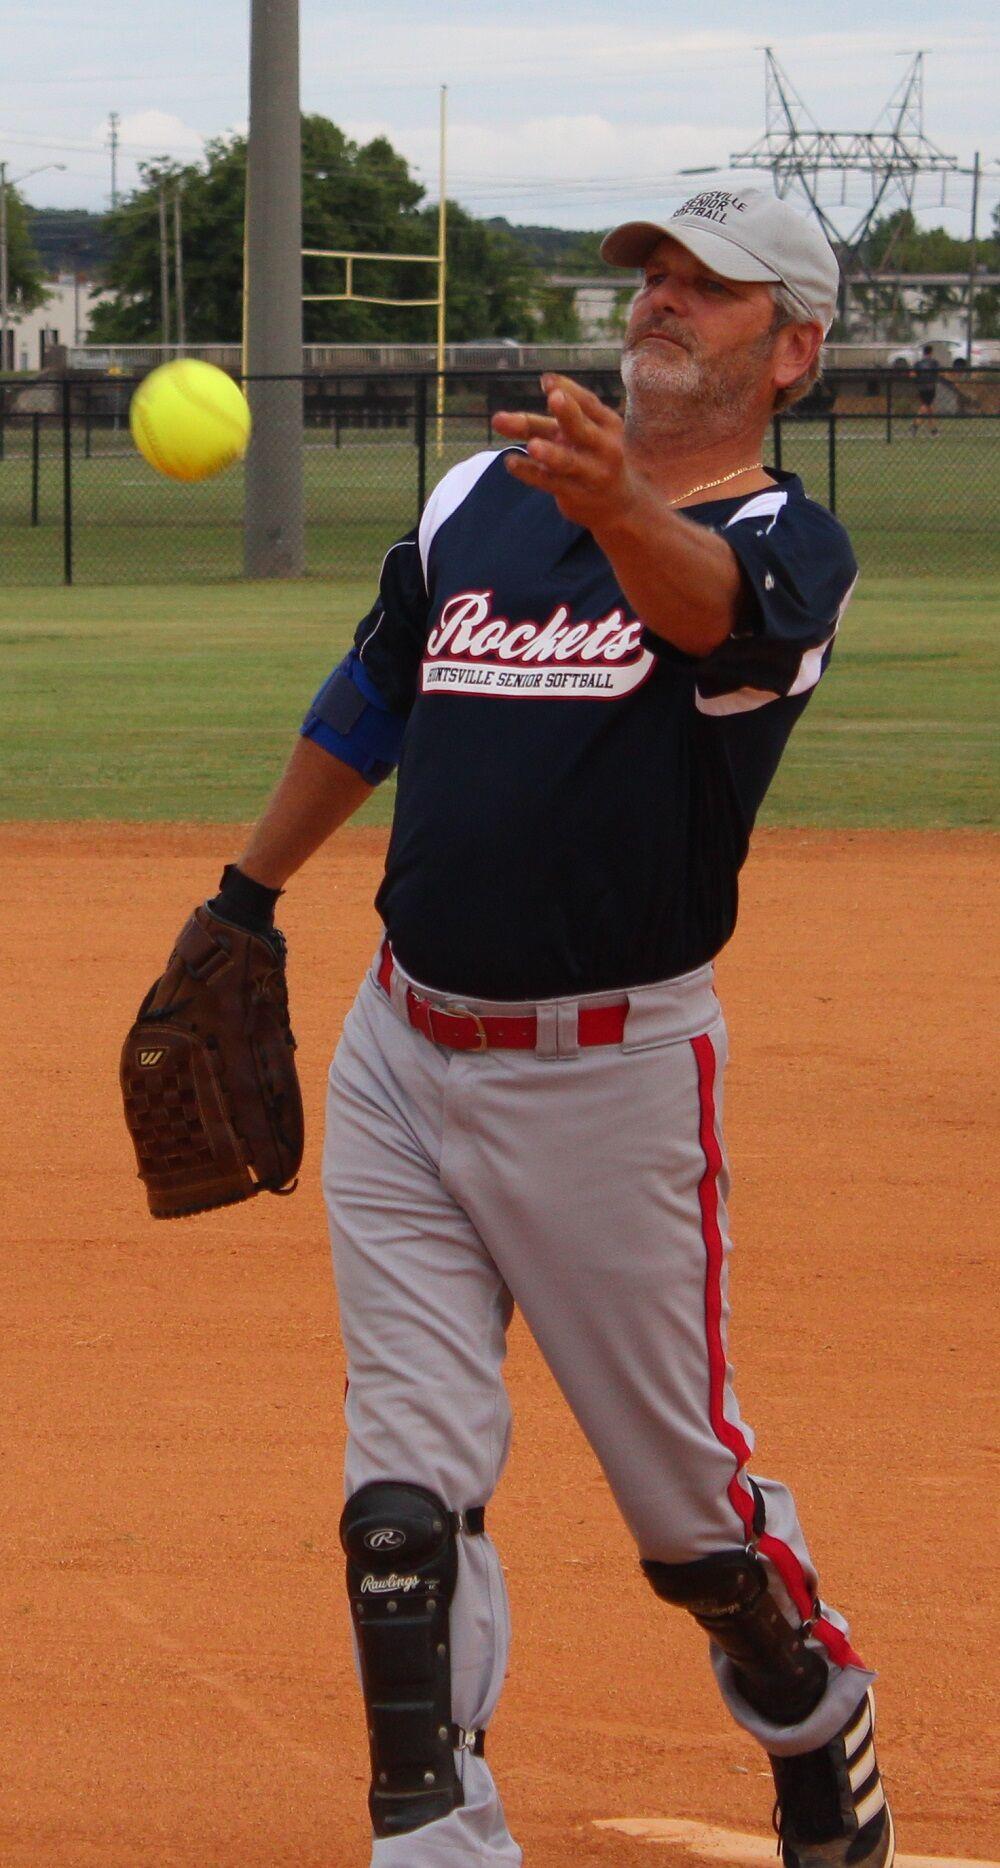 Navy blue 2 pitcher.jpg